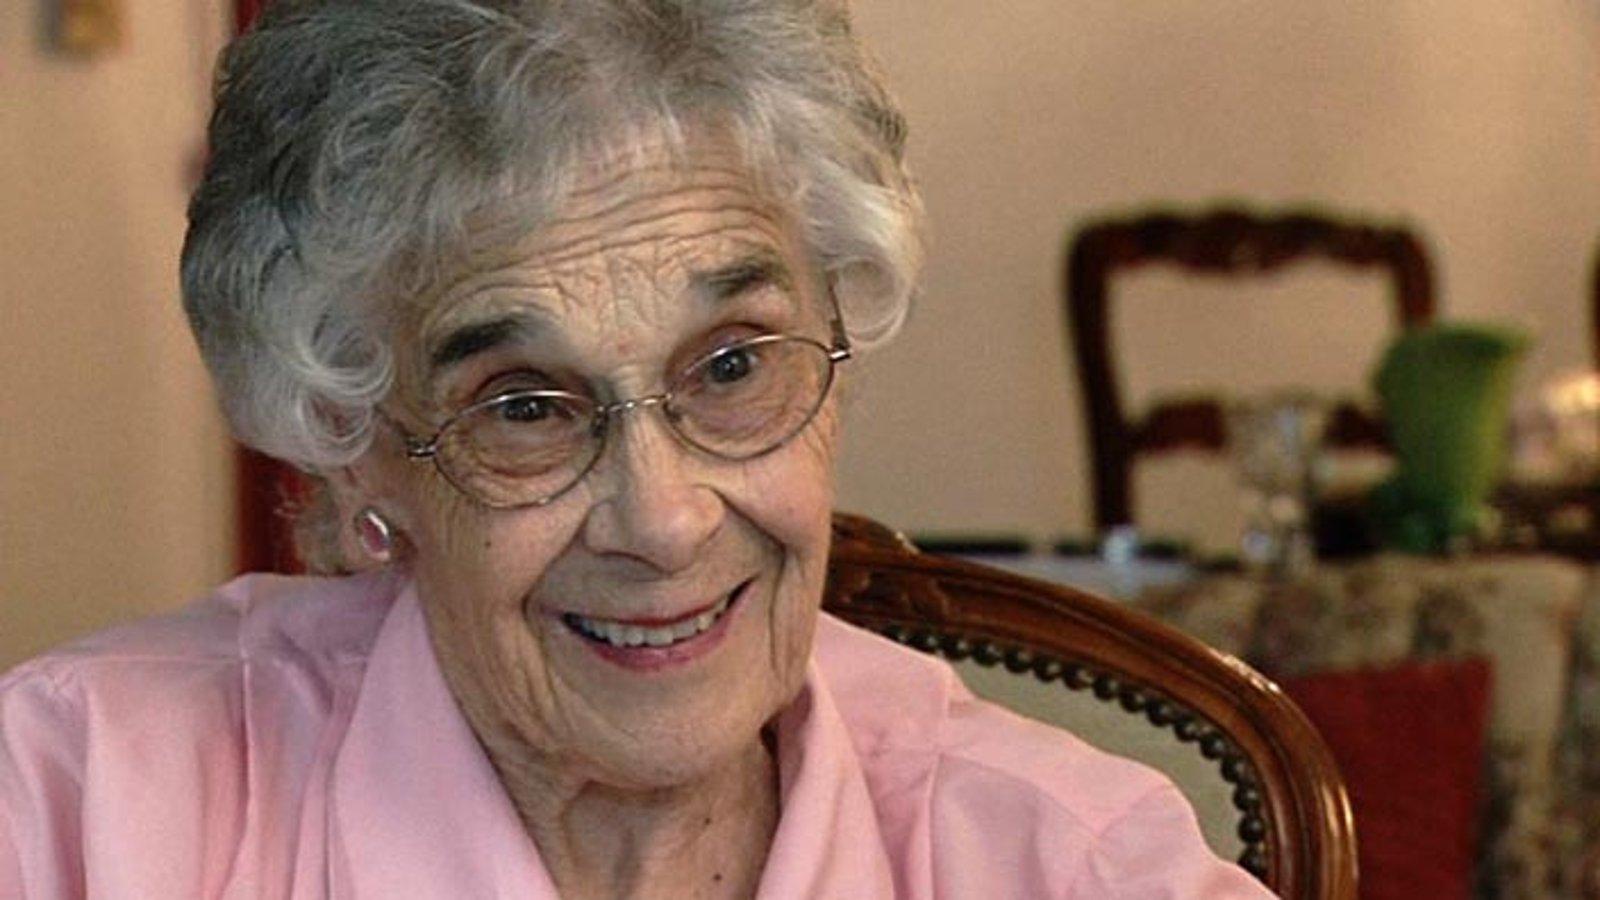 The Elder Project - Seven Seniors Face the Future